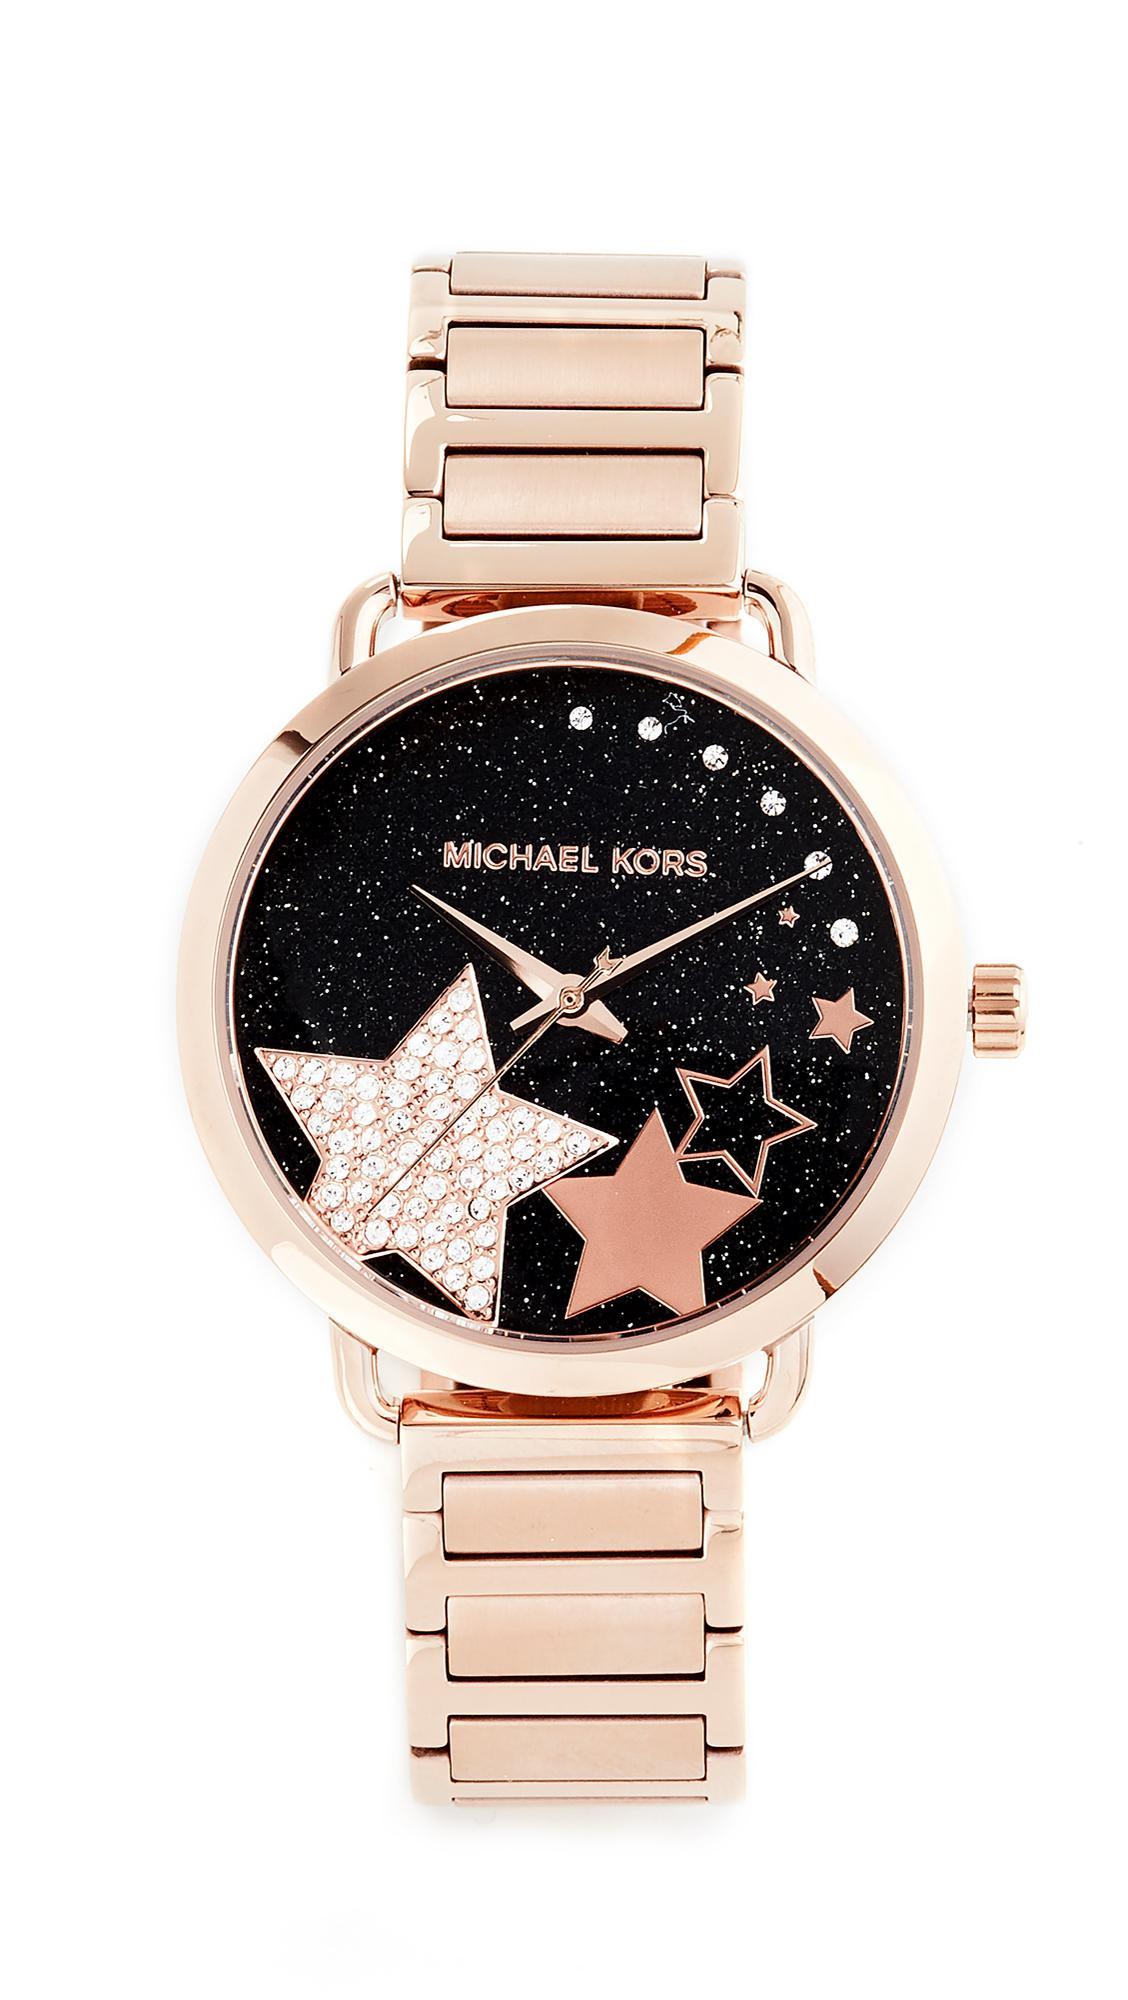 8b56501297a8 Lyst - Michael Kors Celestial Portia Watch